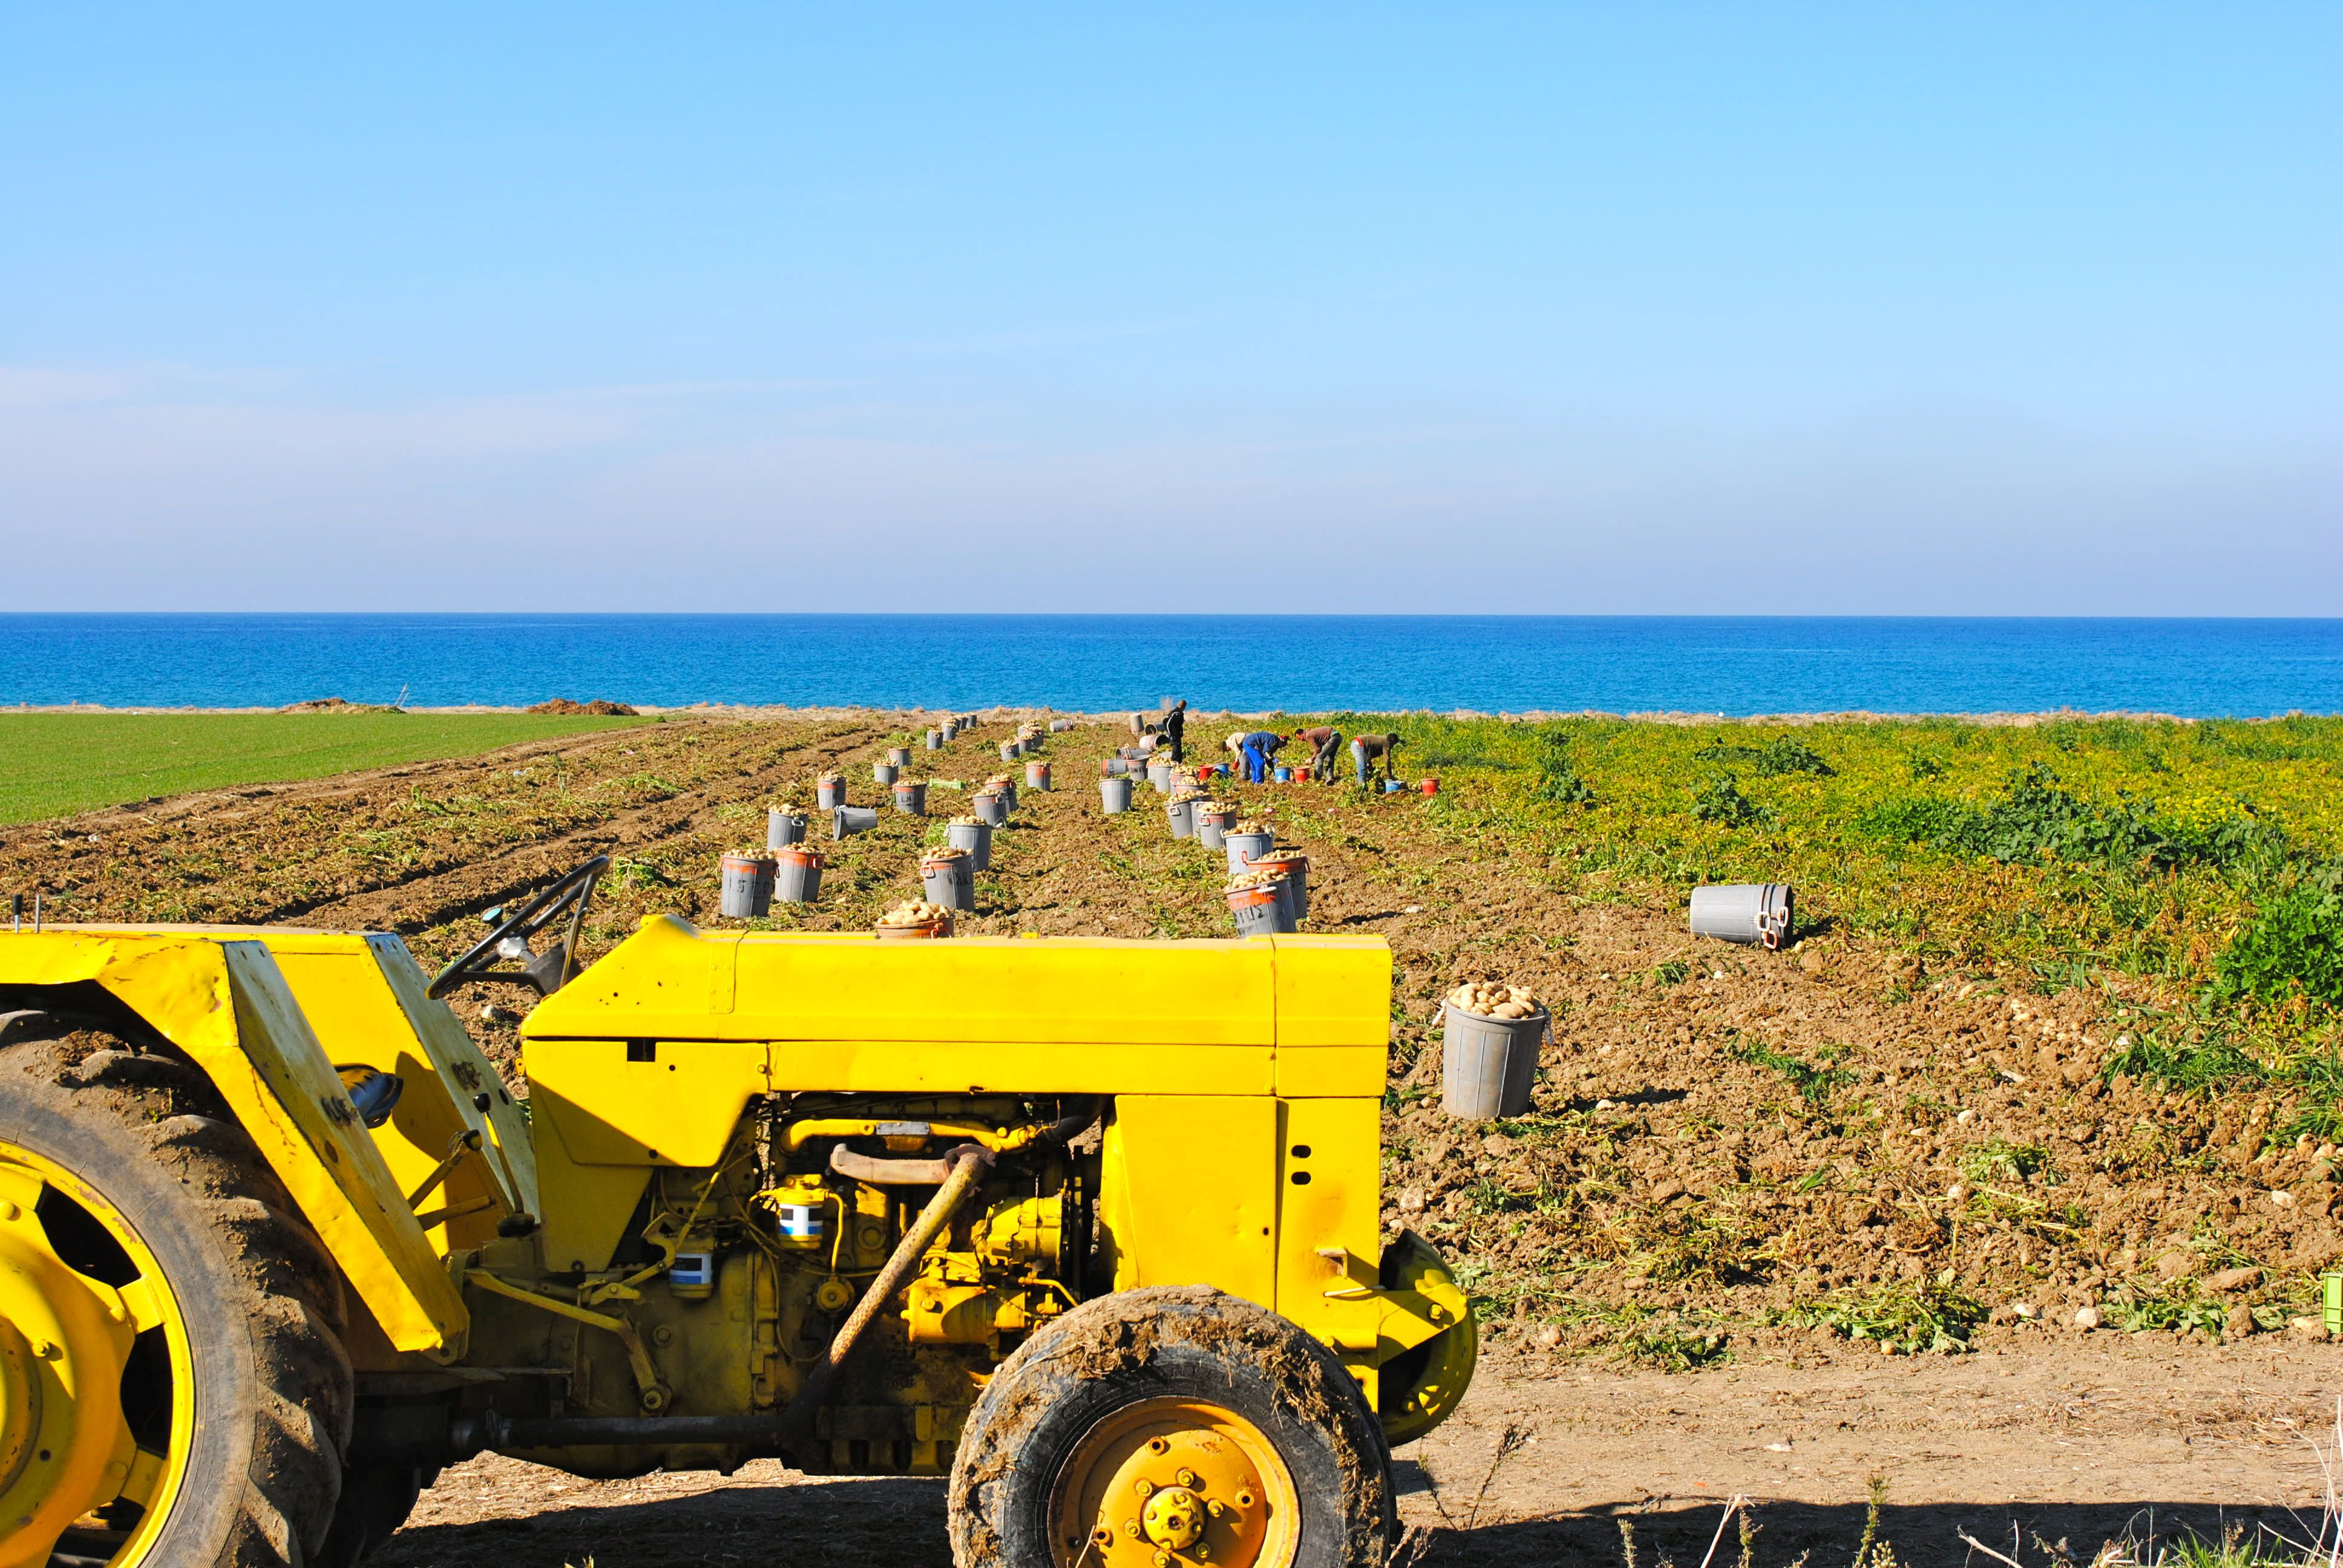 potato pickers Christmas Eve on Cyprus